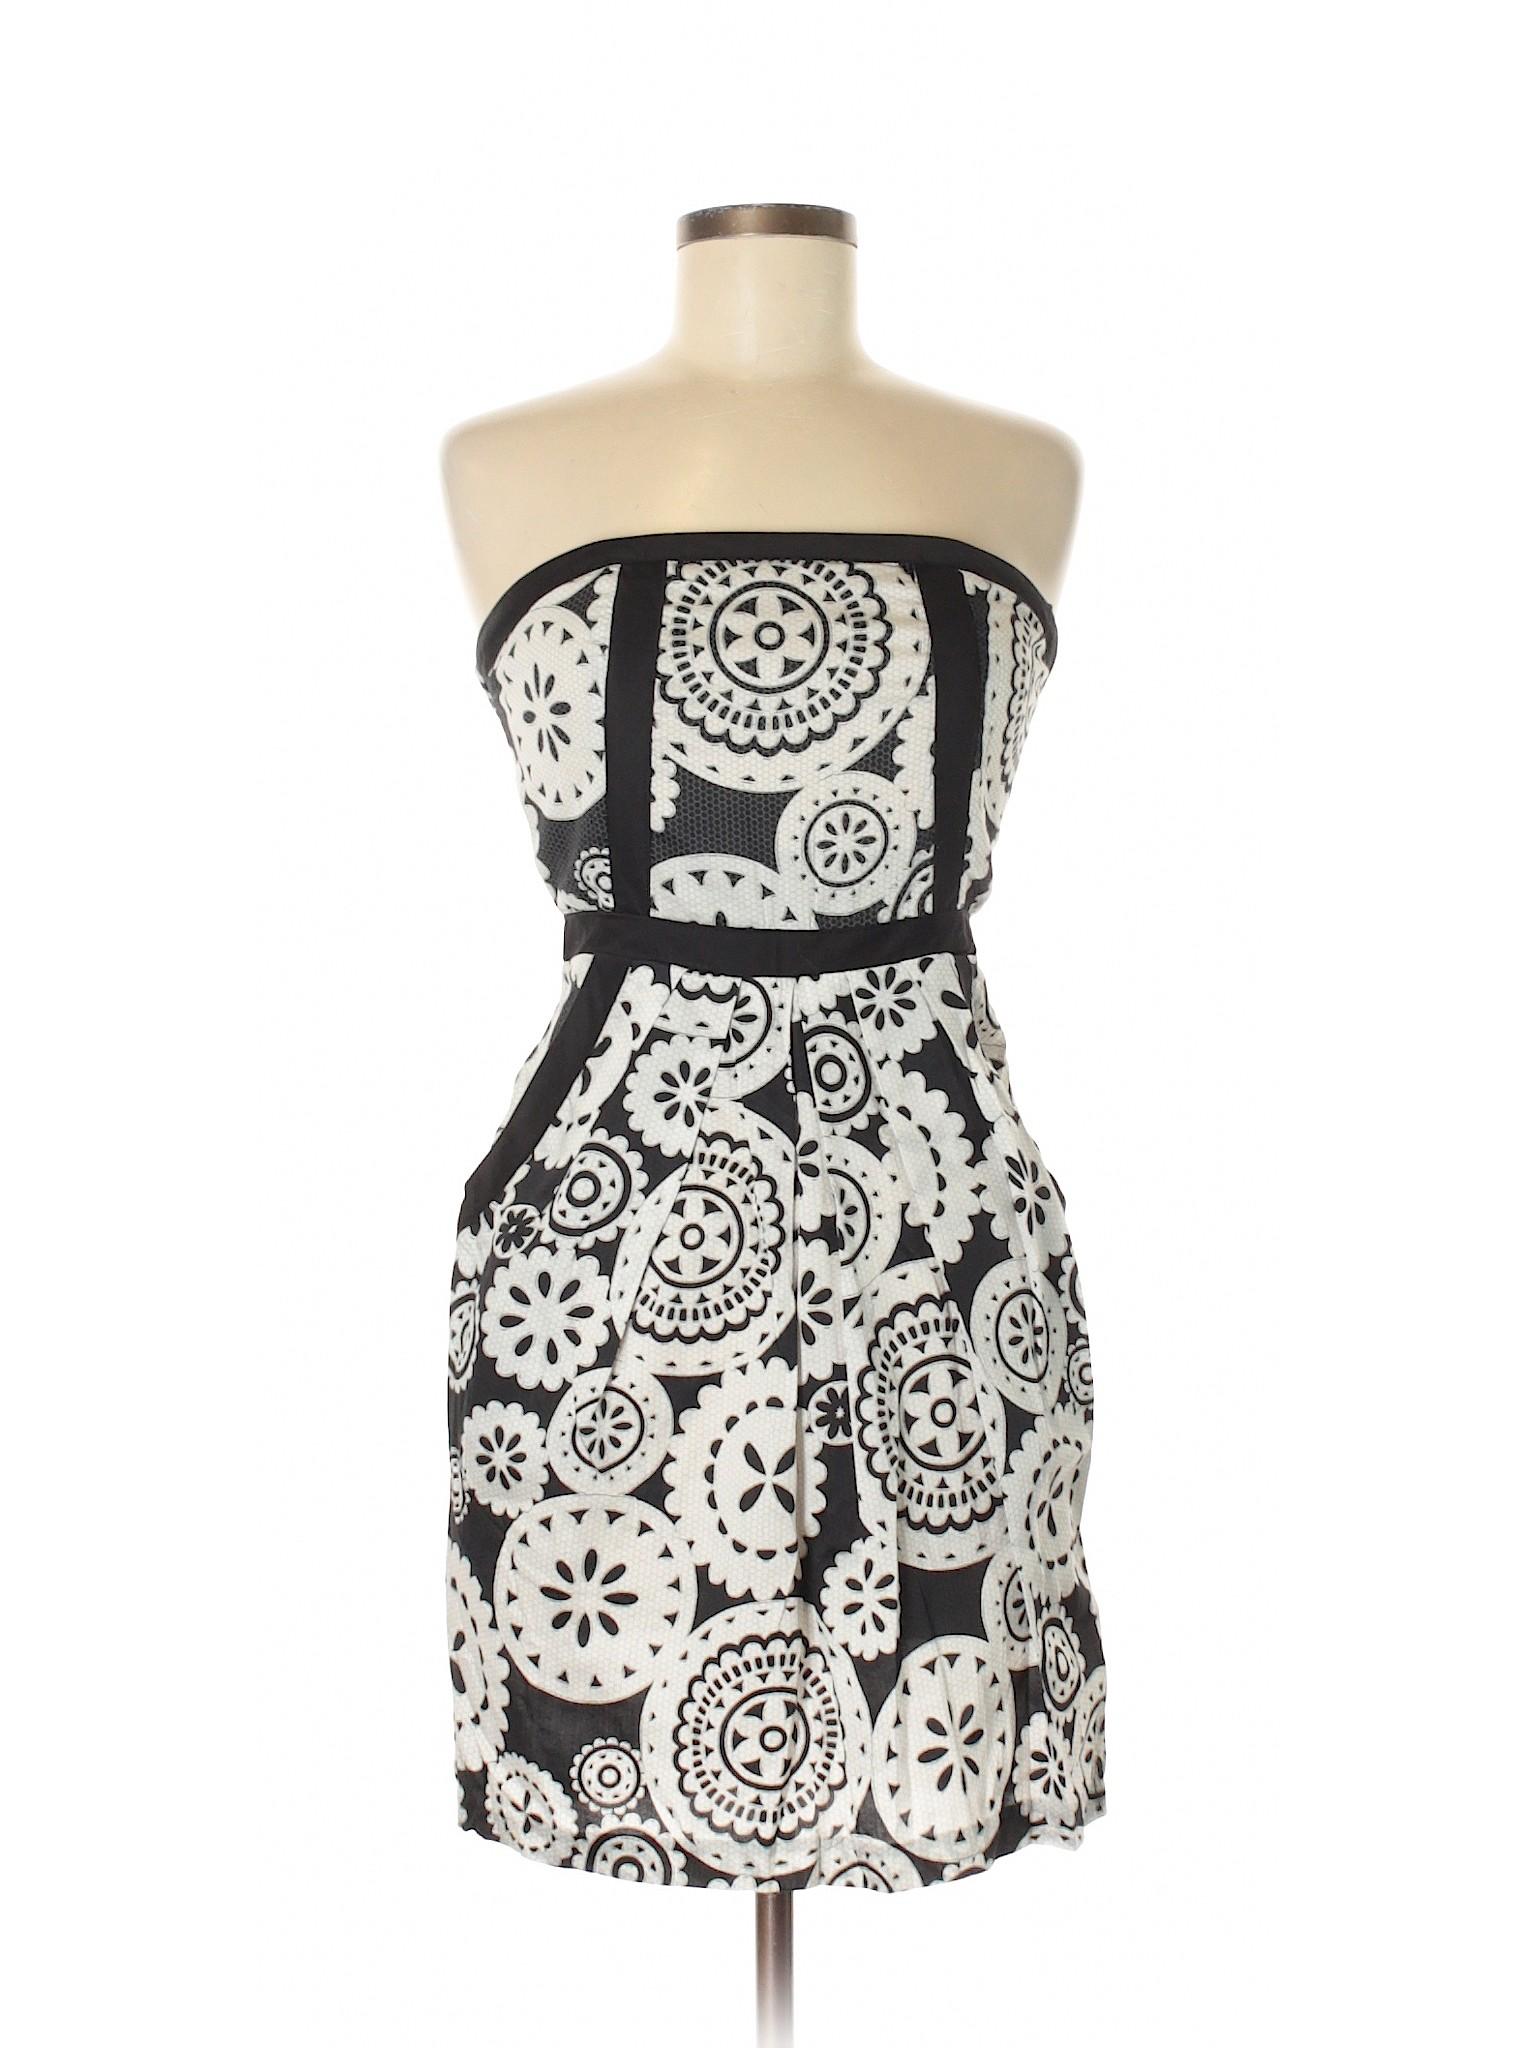 Mystic Casual Selling Mystic Dress Selling E1qzxwz4a